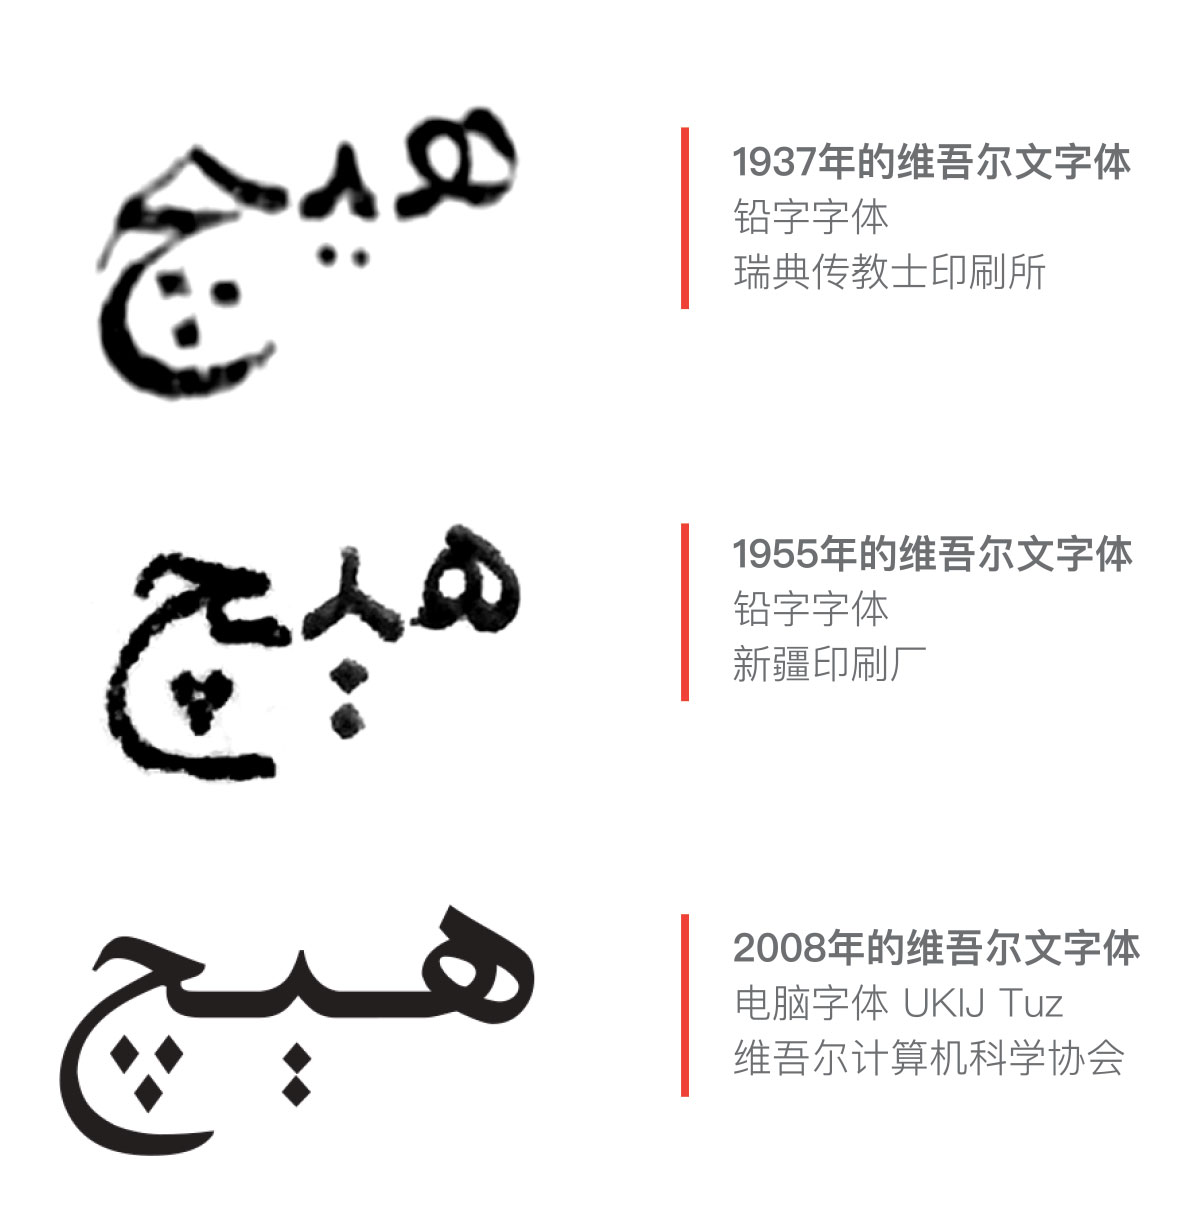 uyghur_8